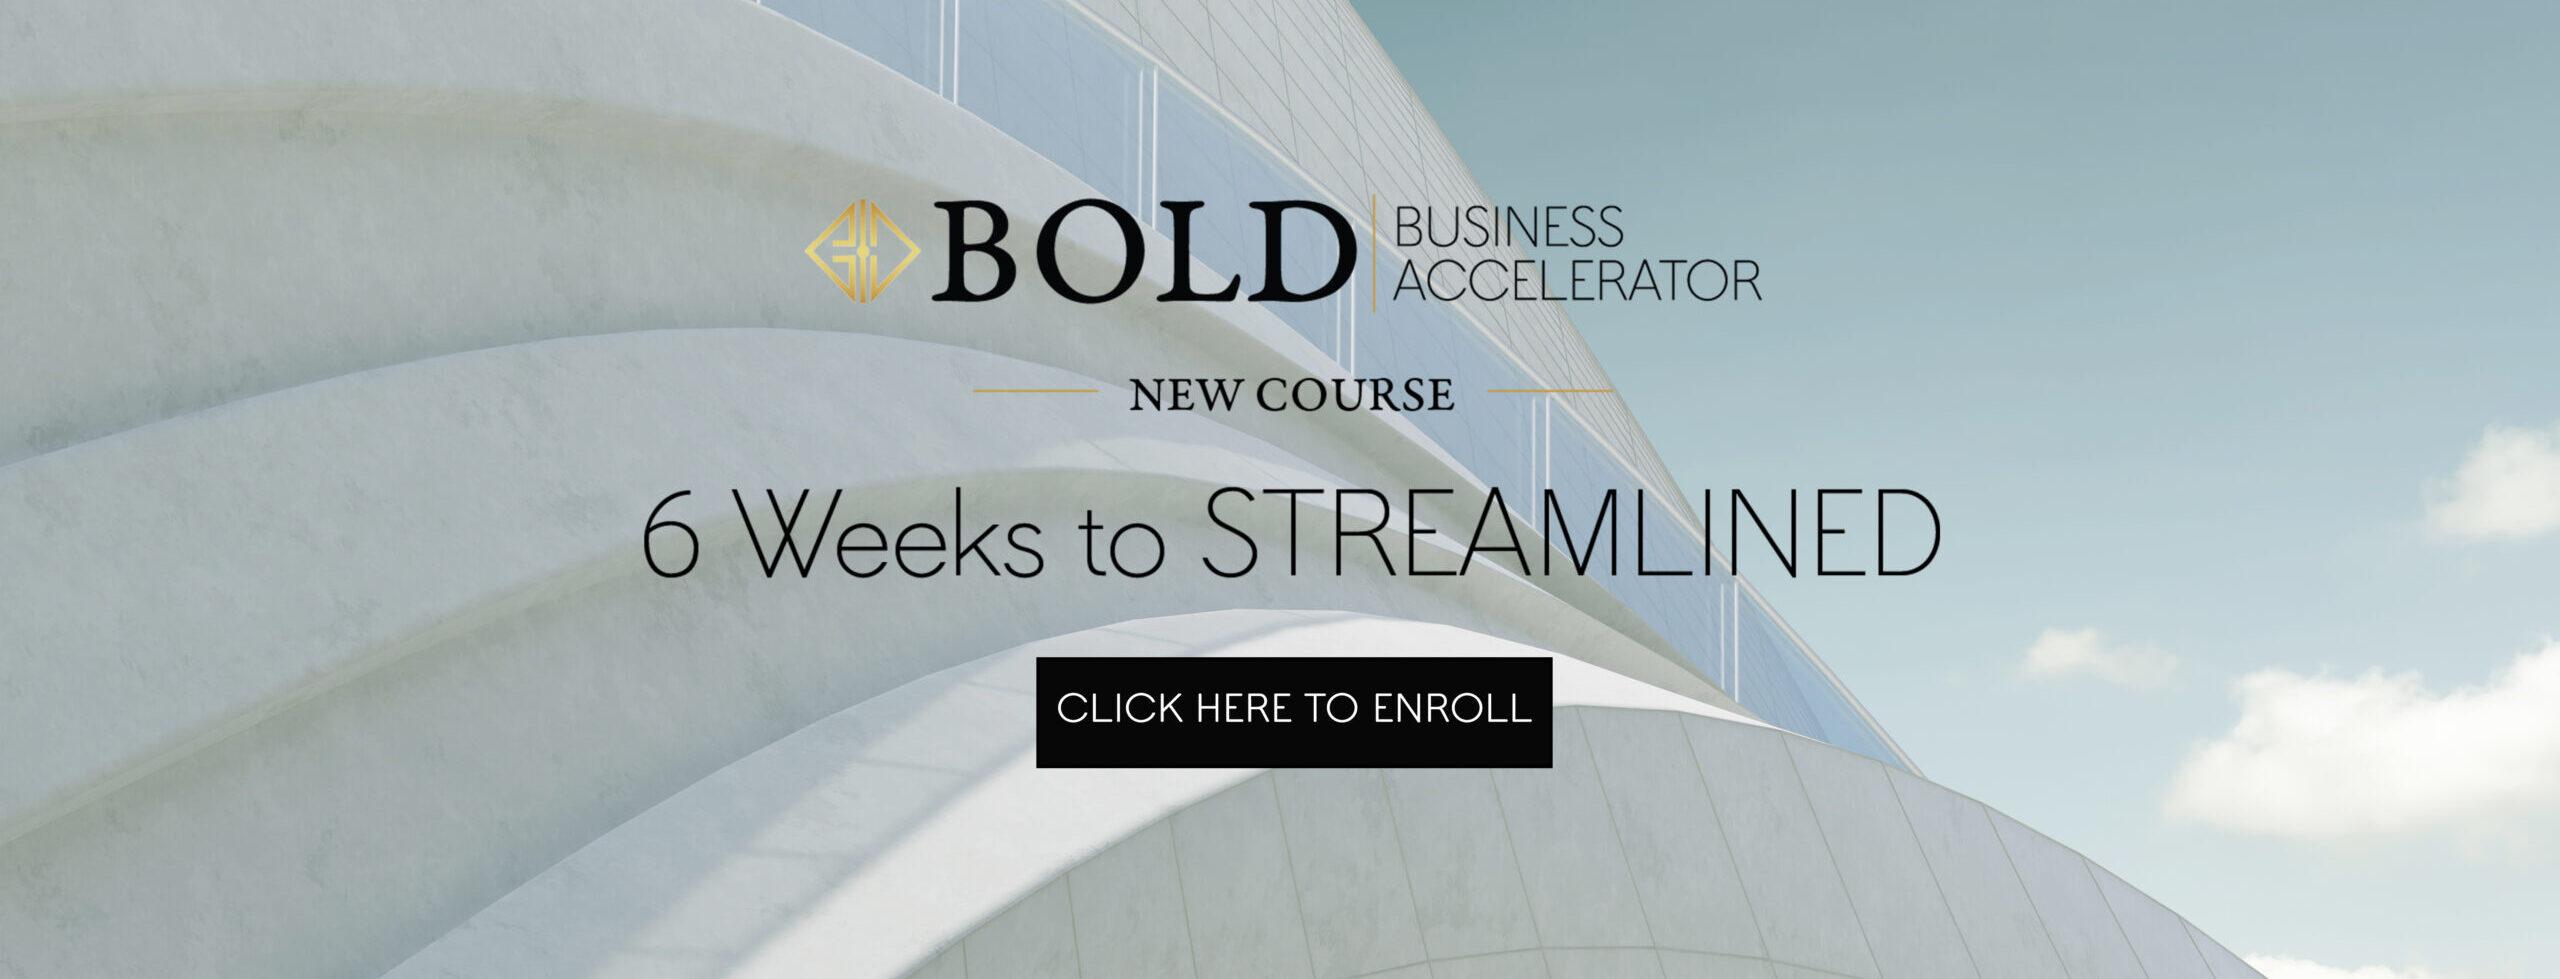 BOLD Business Accelerator Course